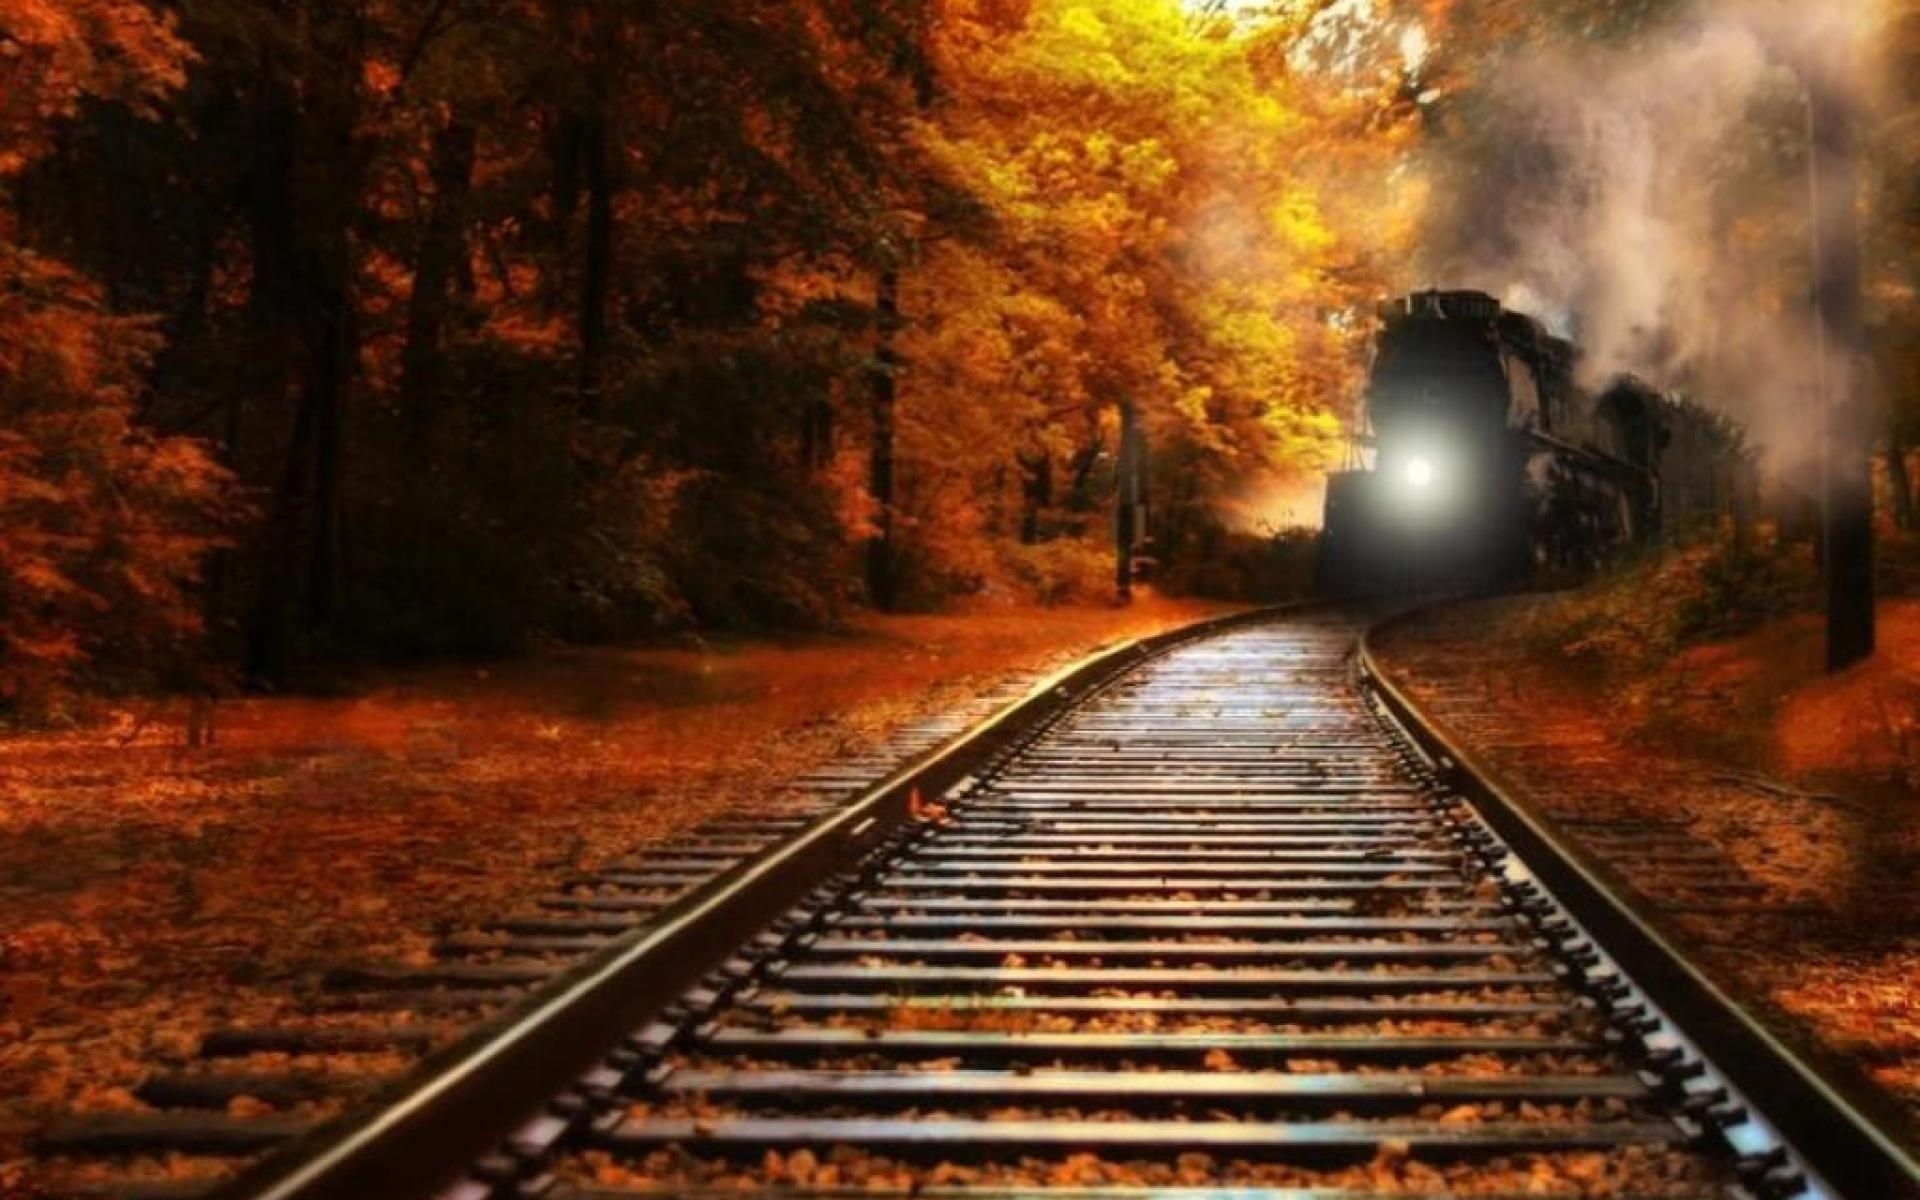 Railway Tracks Wallpapers - Wallpaper Cave